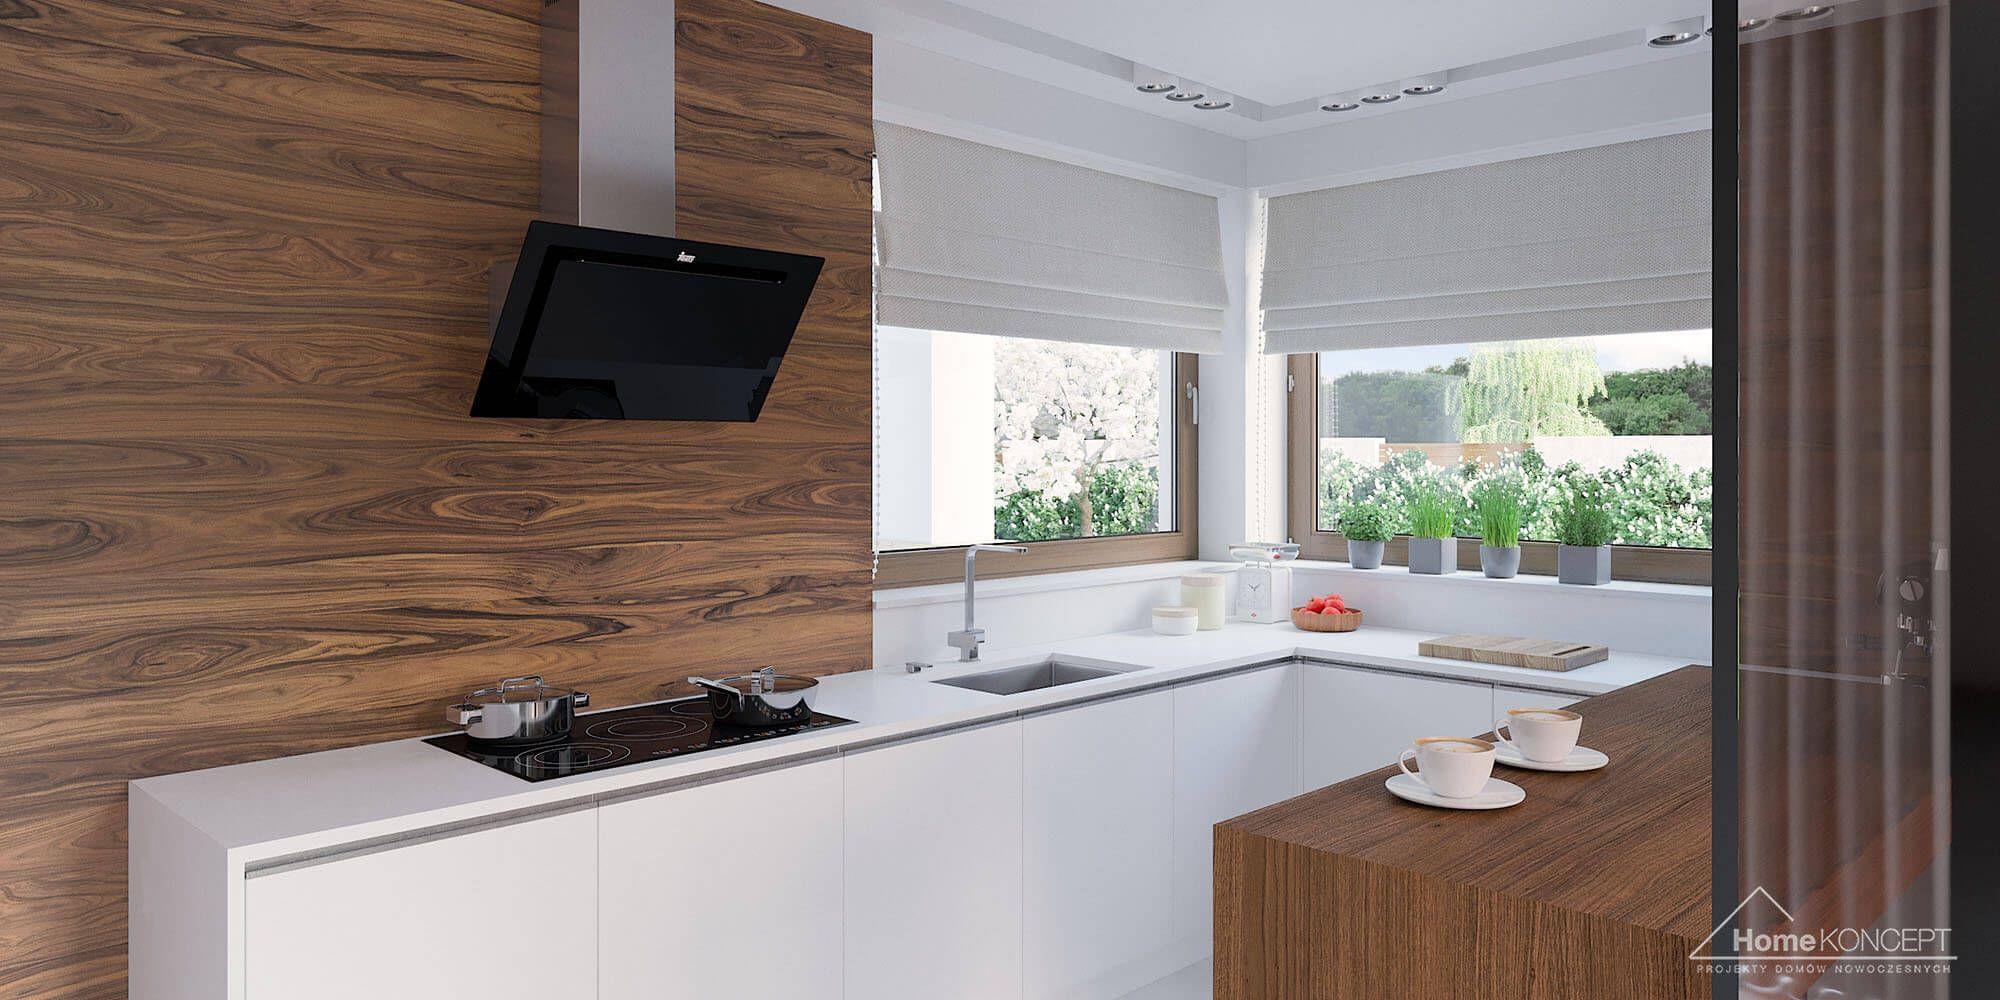 Projekt Domu Homekoncept 07 In 2019 Okno Narożne W Kuchni